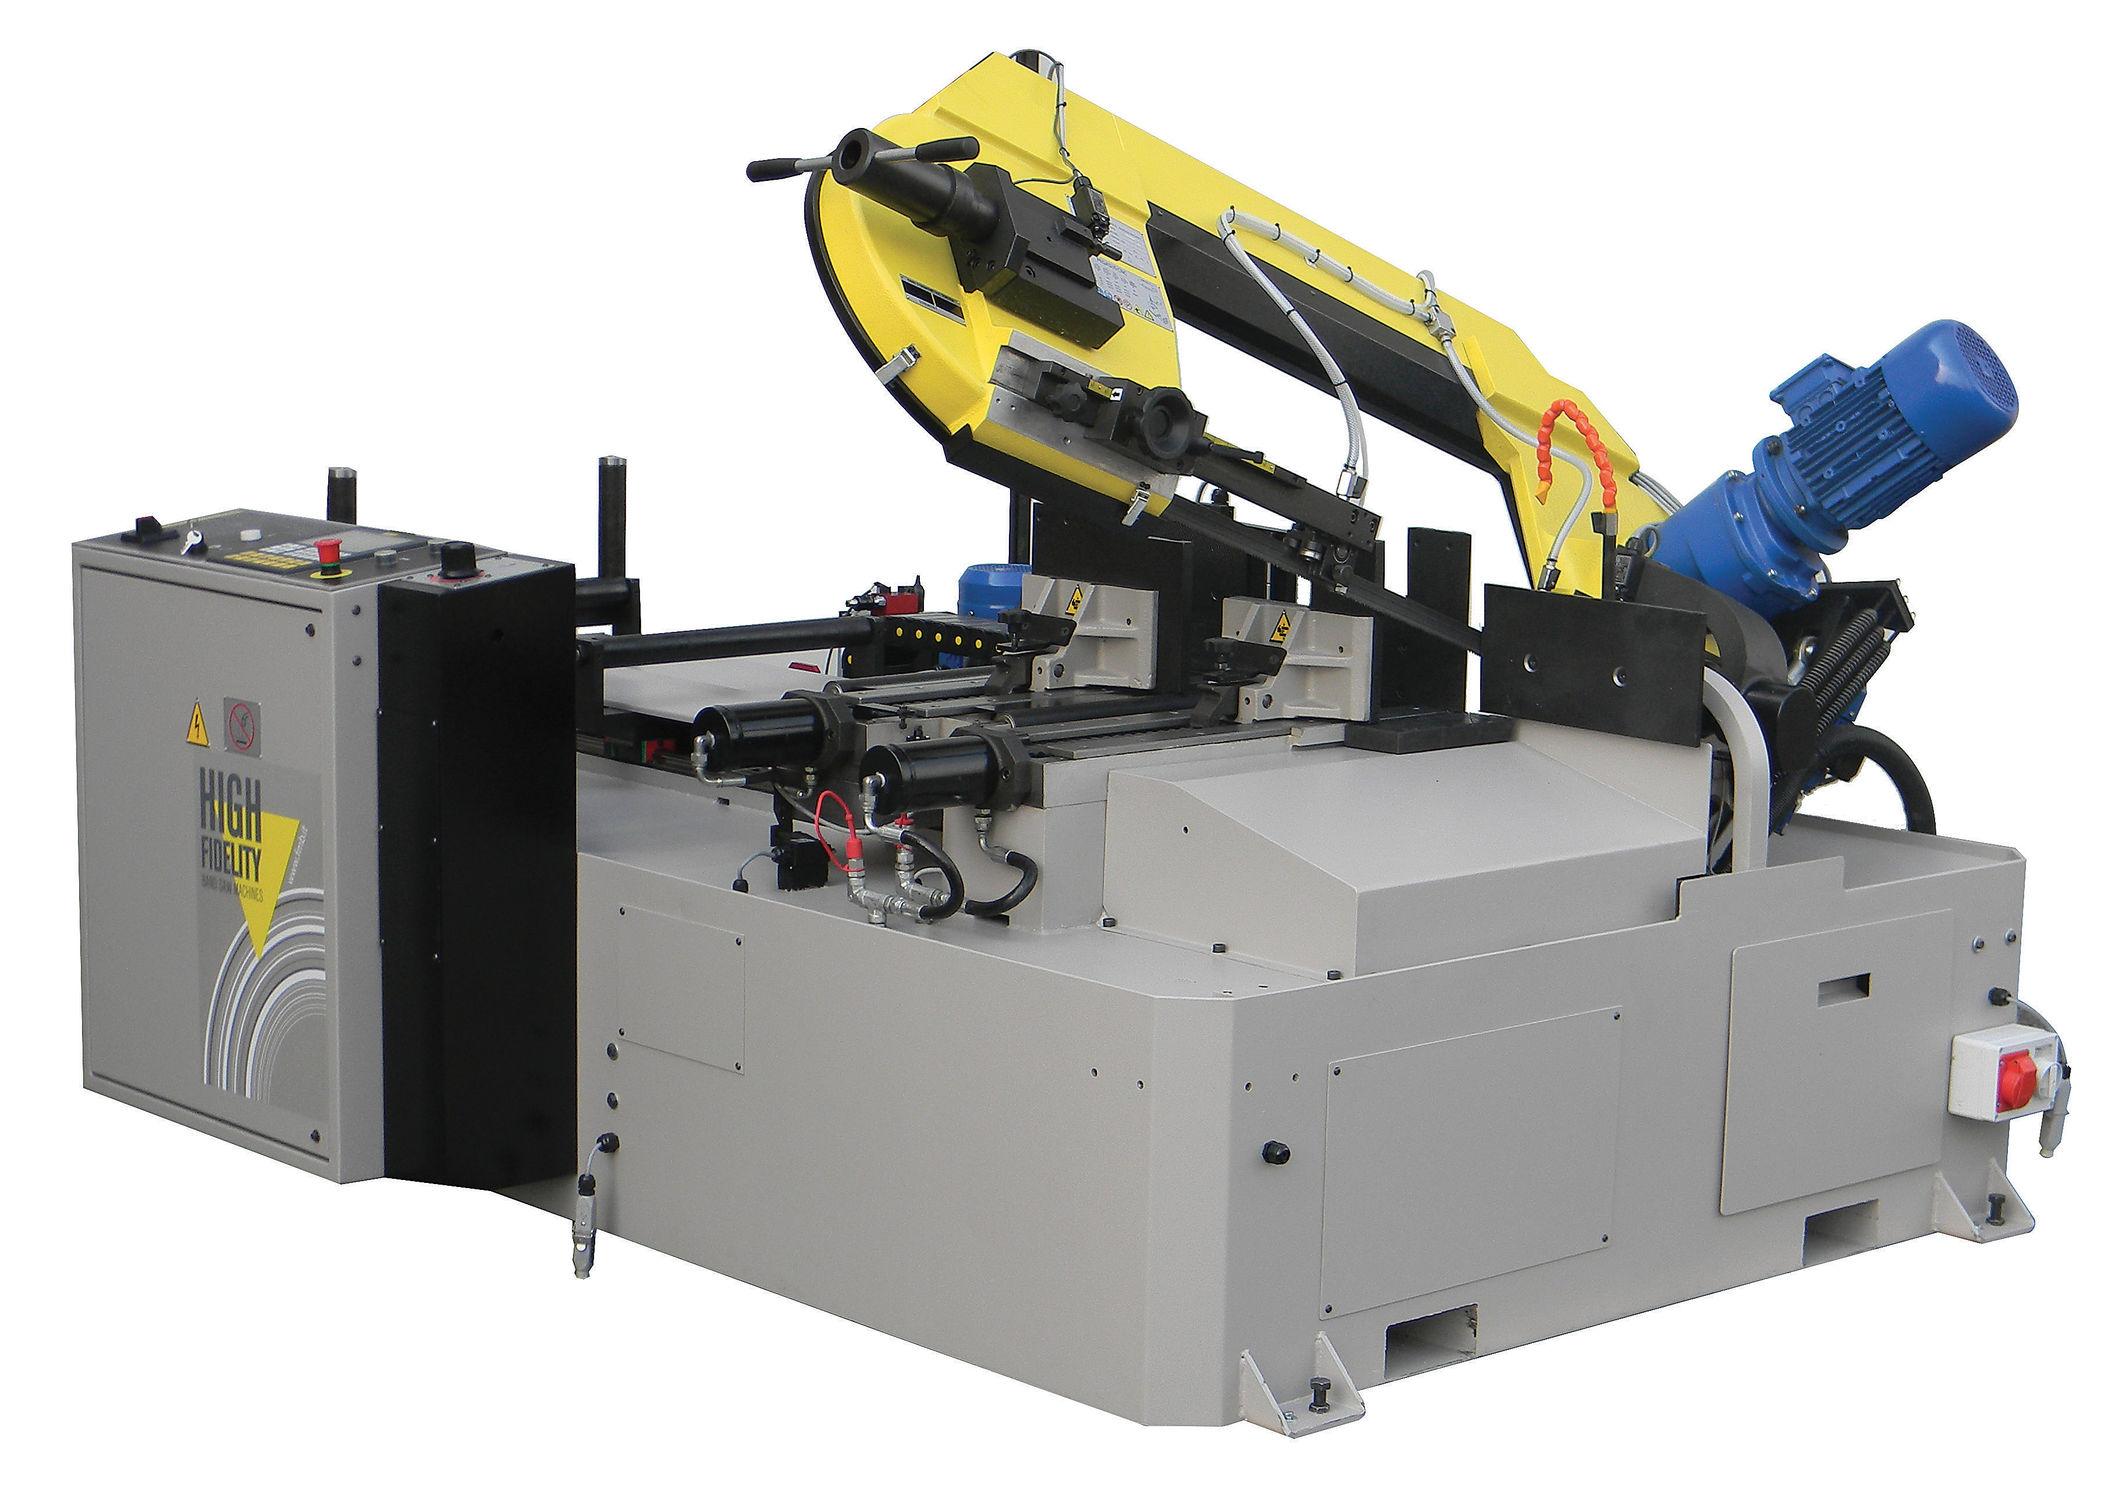 CNC automatic horizontal band saw